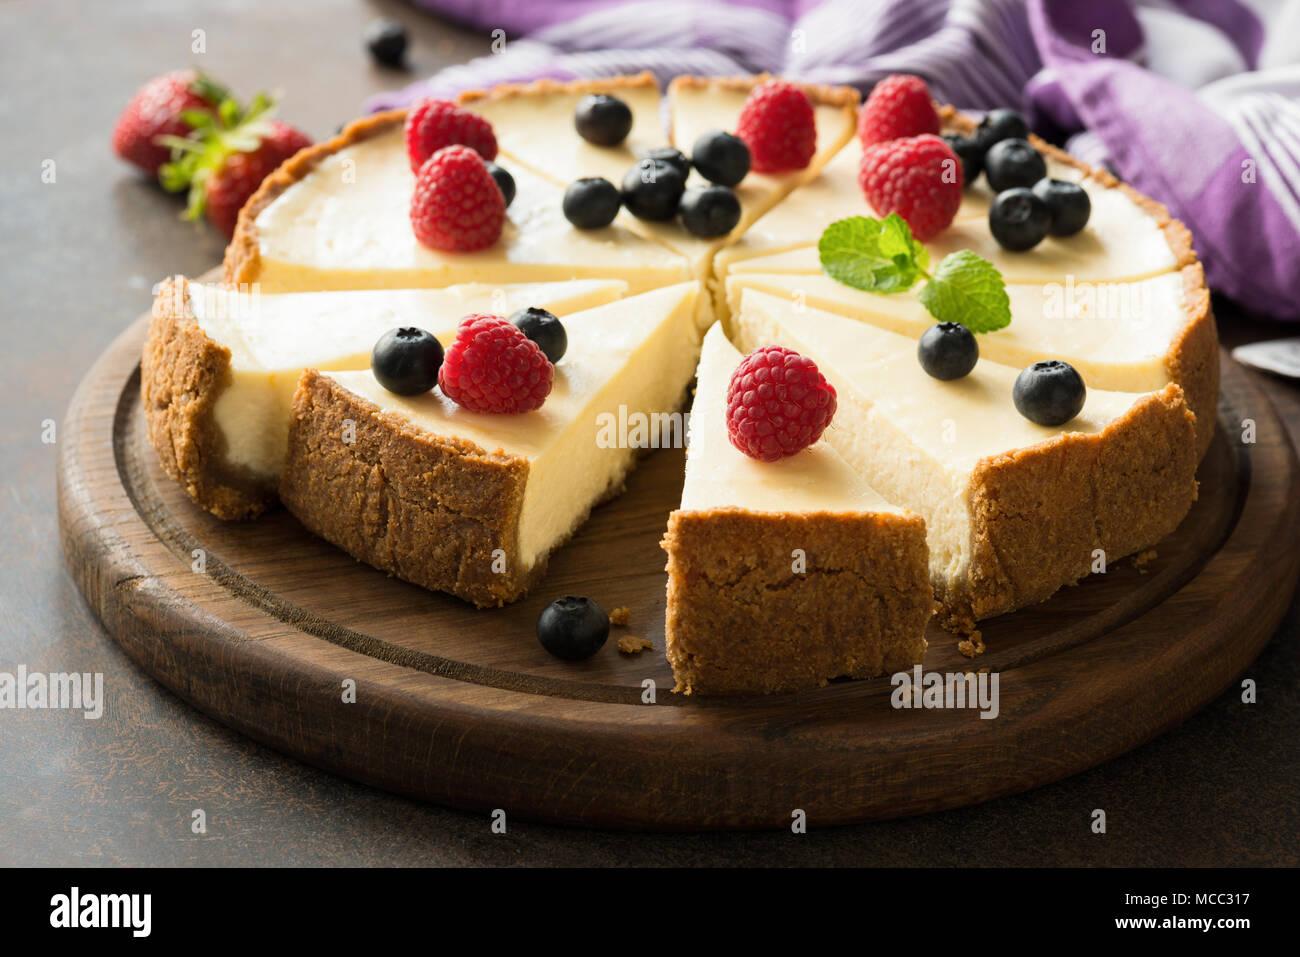 Verano berry cheesecake cortados en rodajas. Enfoque selectivo Imagen De Stock